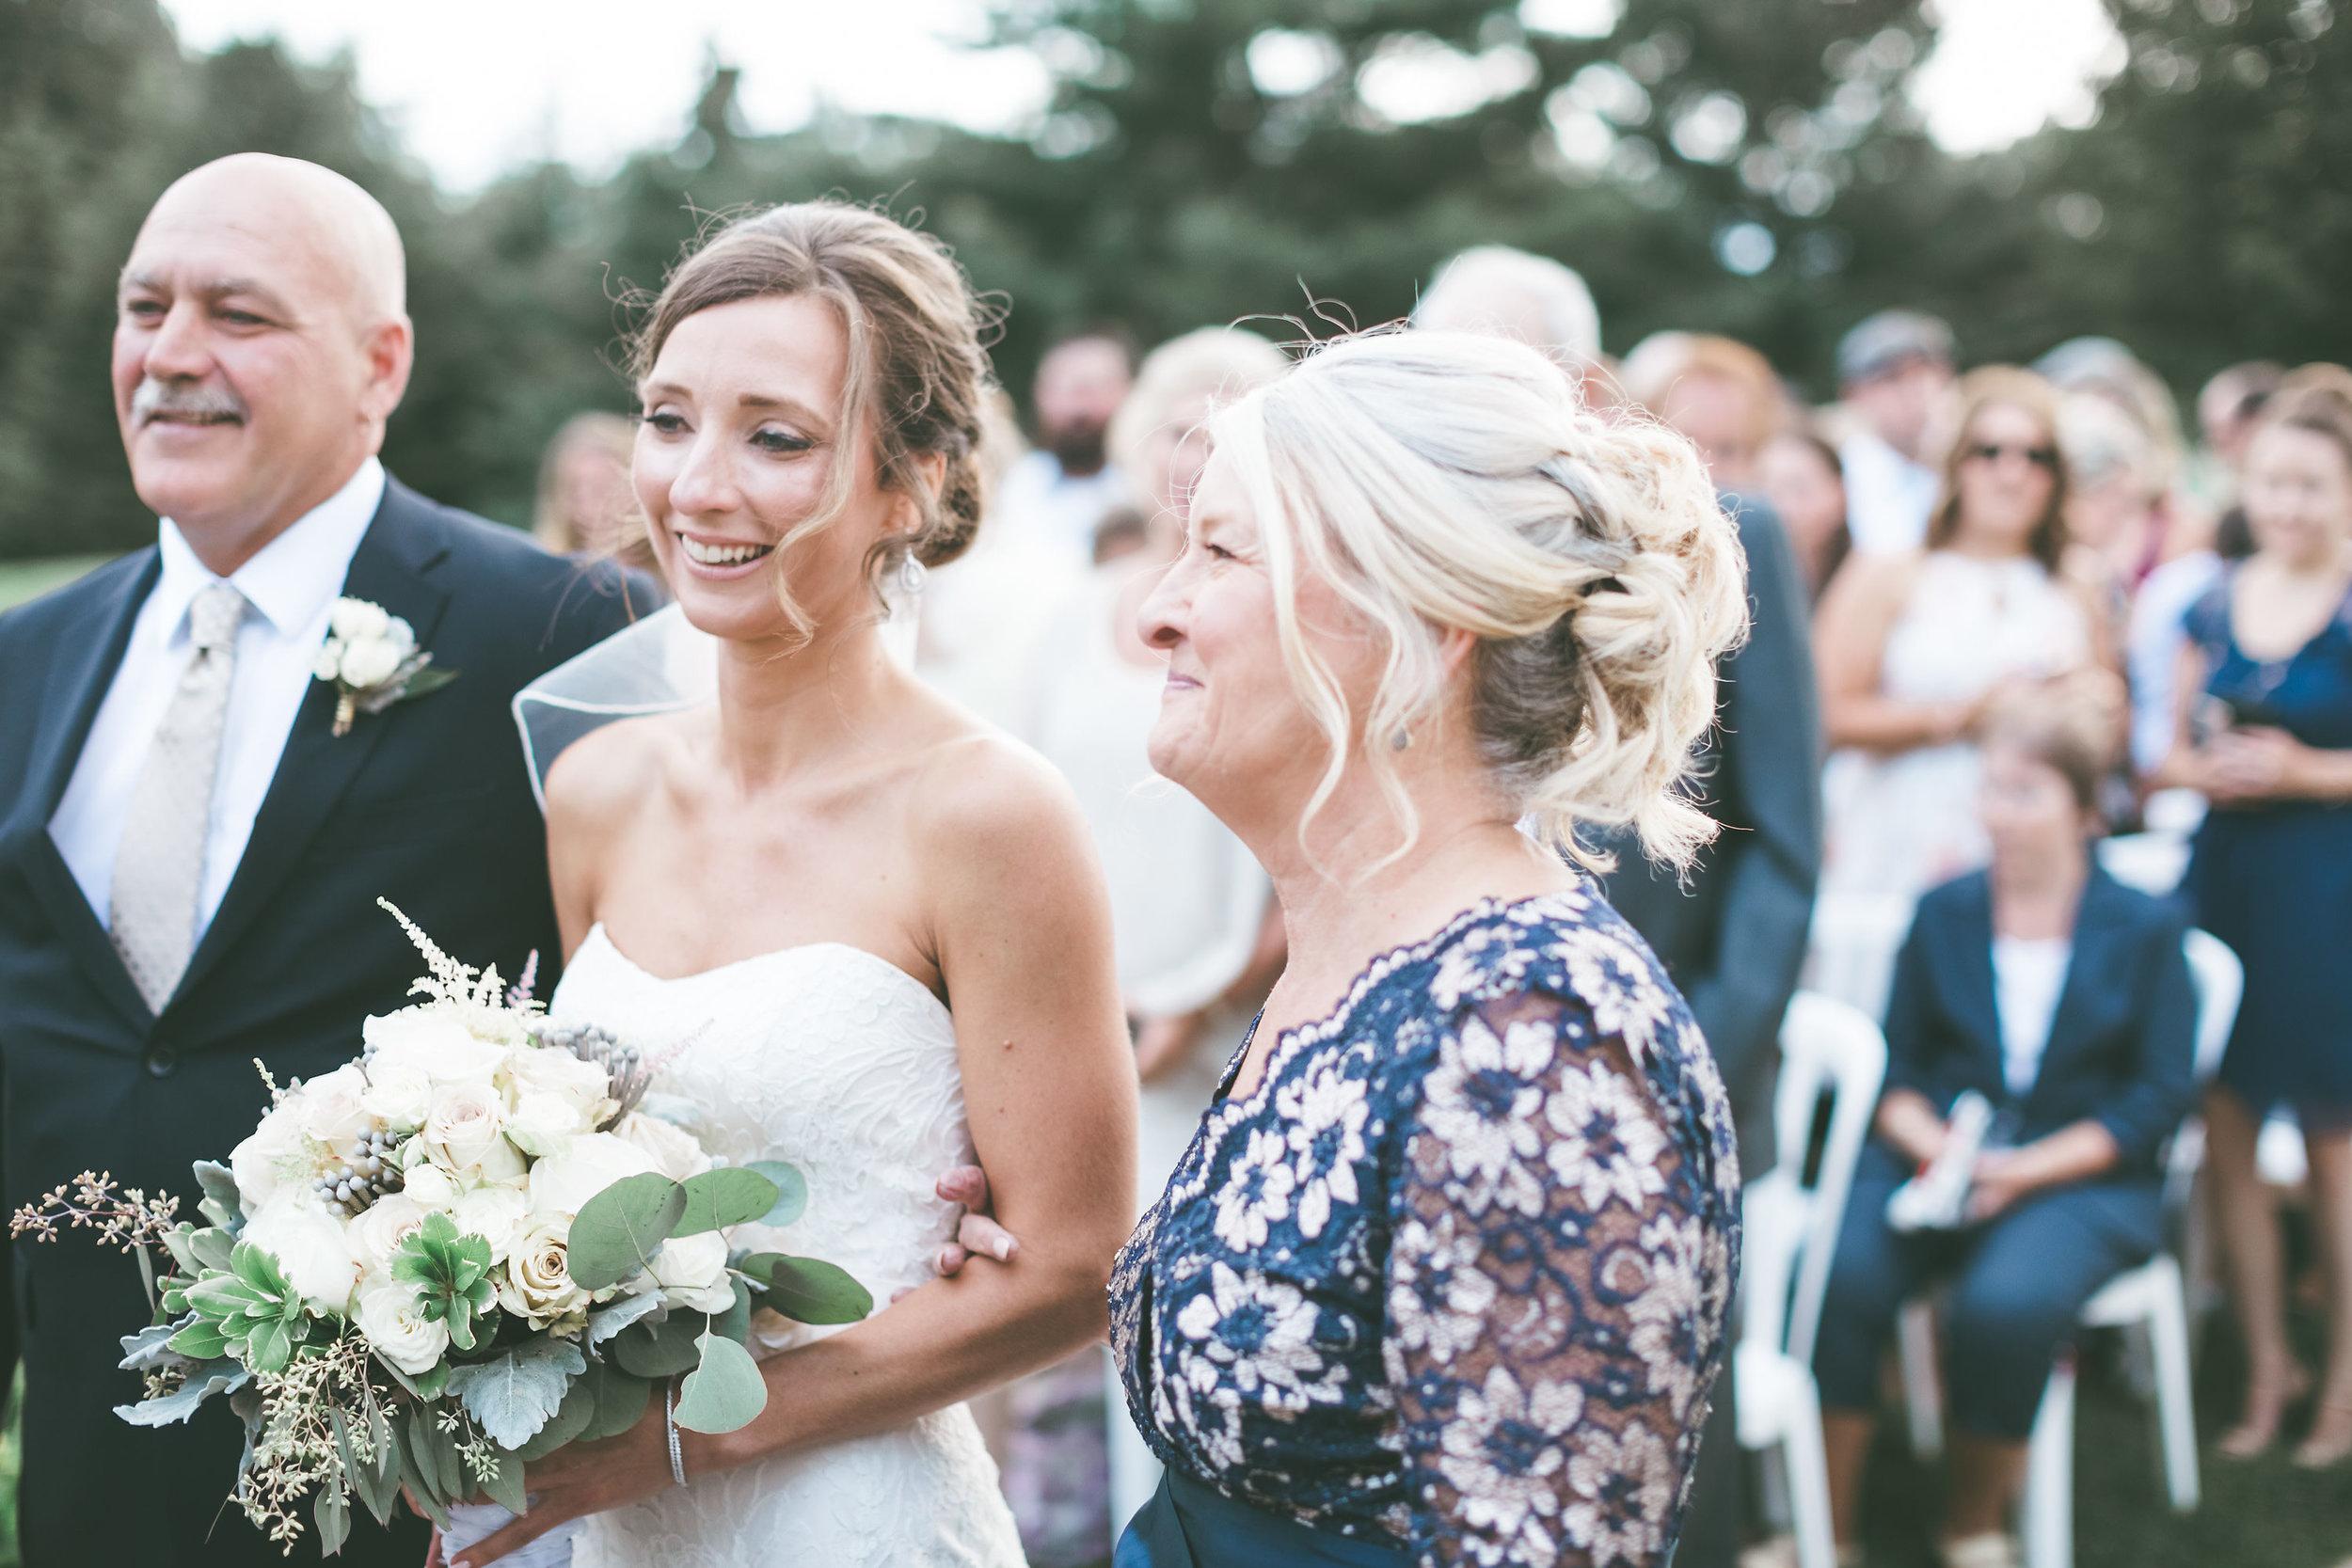 meaghan___darryl_wedding___danielcarusophotography___0770.jpg